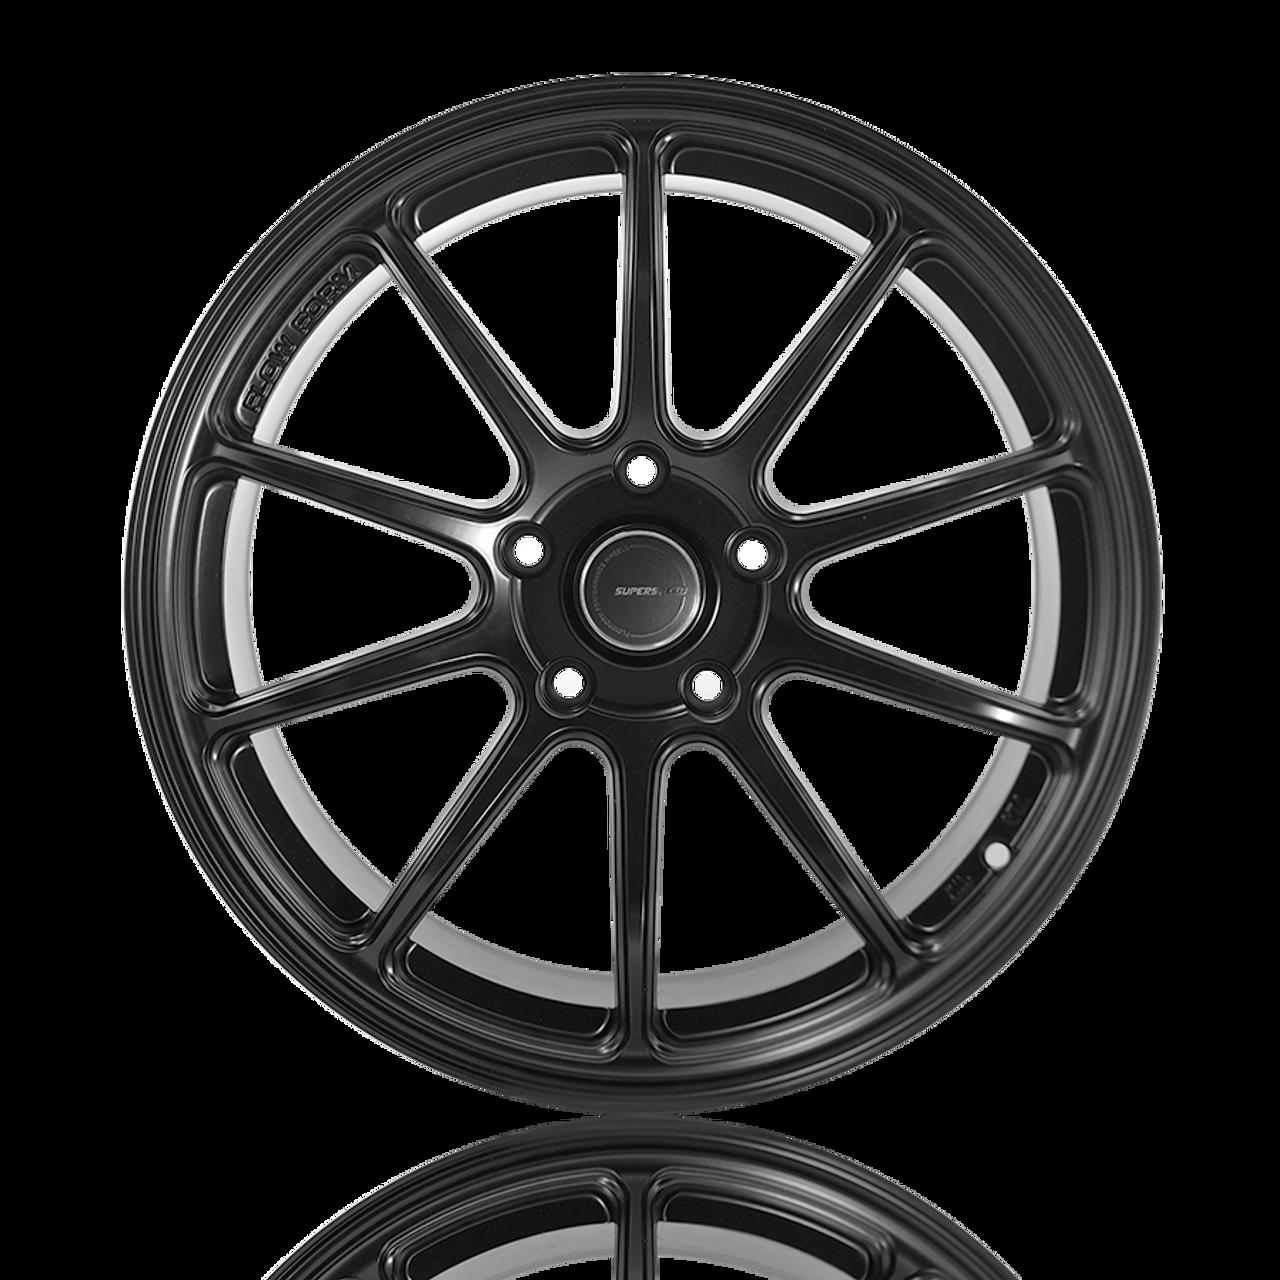 Superspeed Flow Form RF03RR (VW/Audi MQB Fitment)  Set of 4